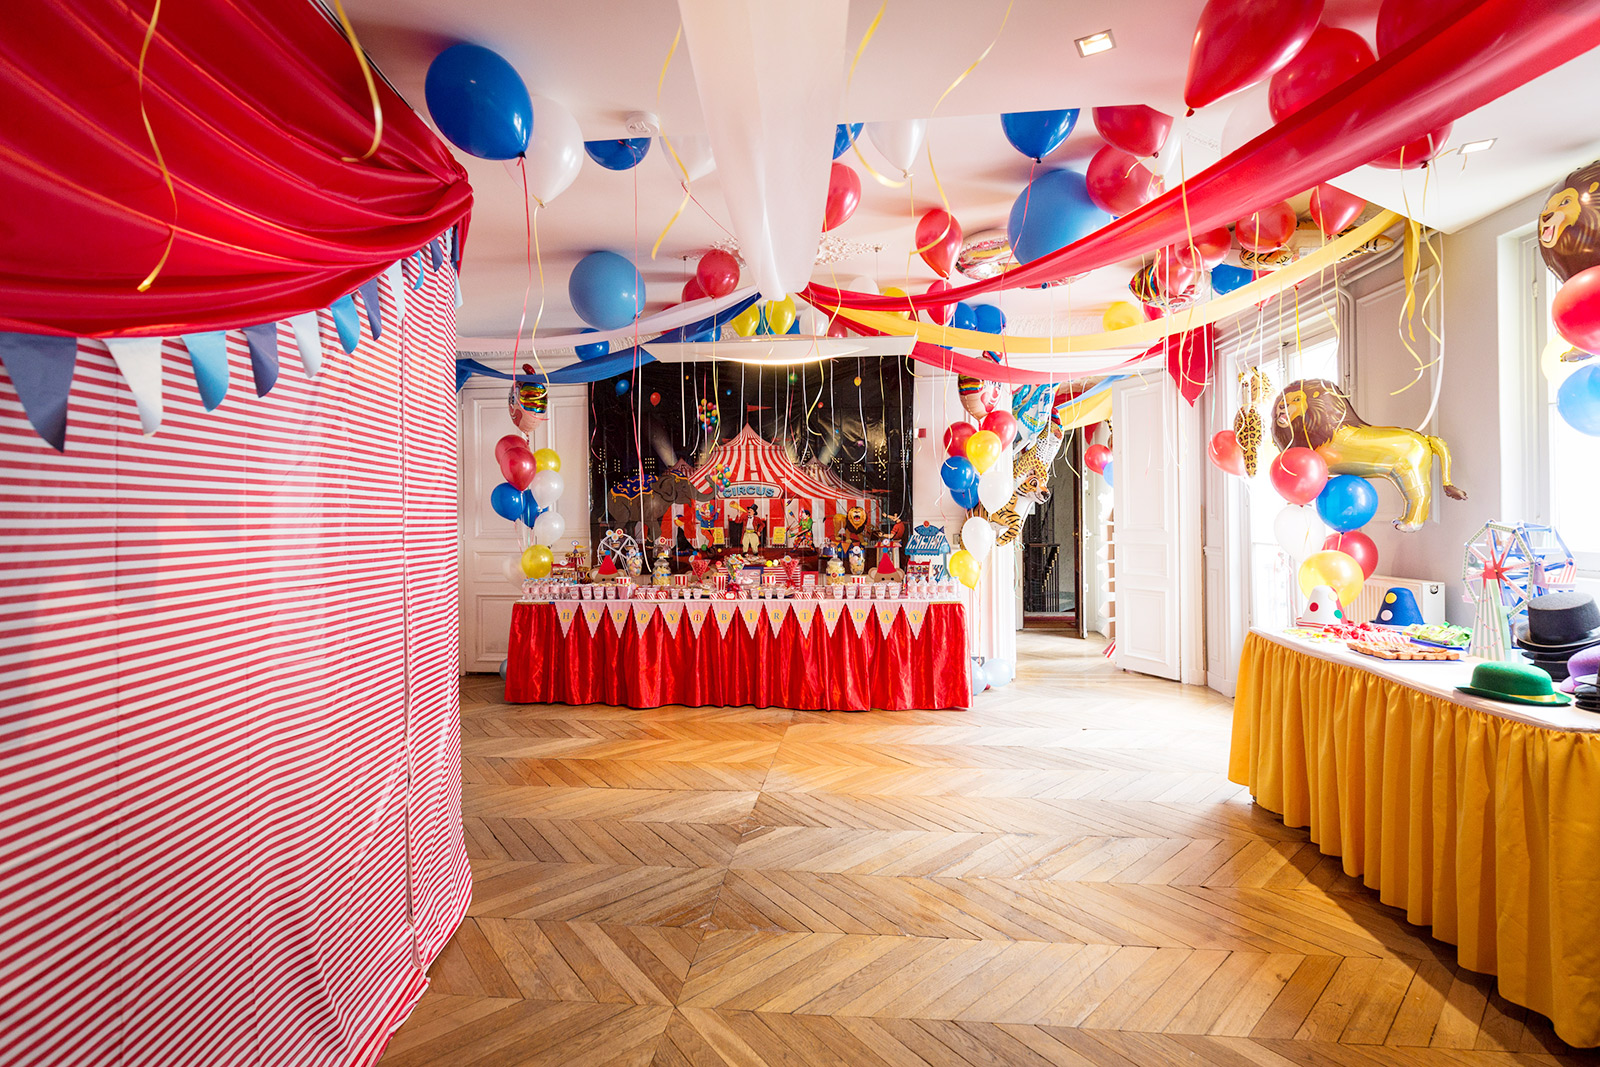 L'anniversaire Cirque de Jacob